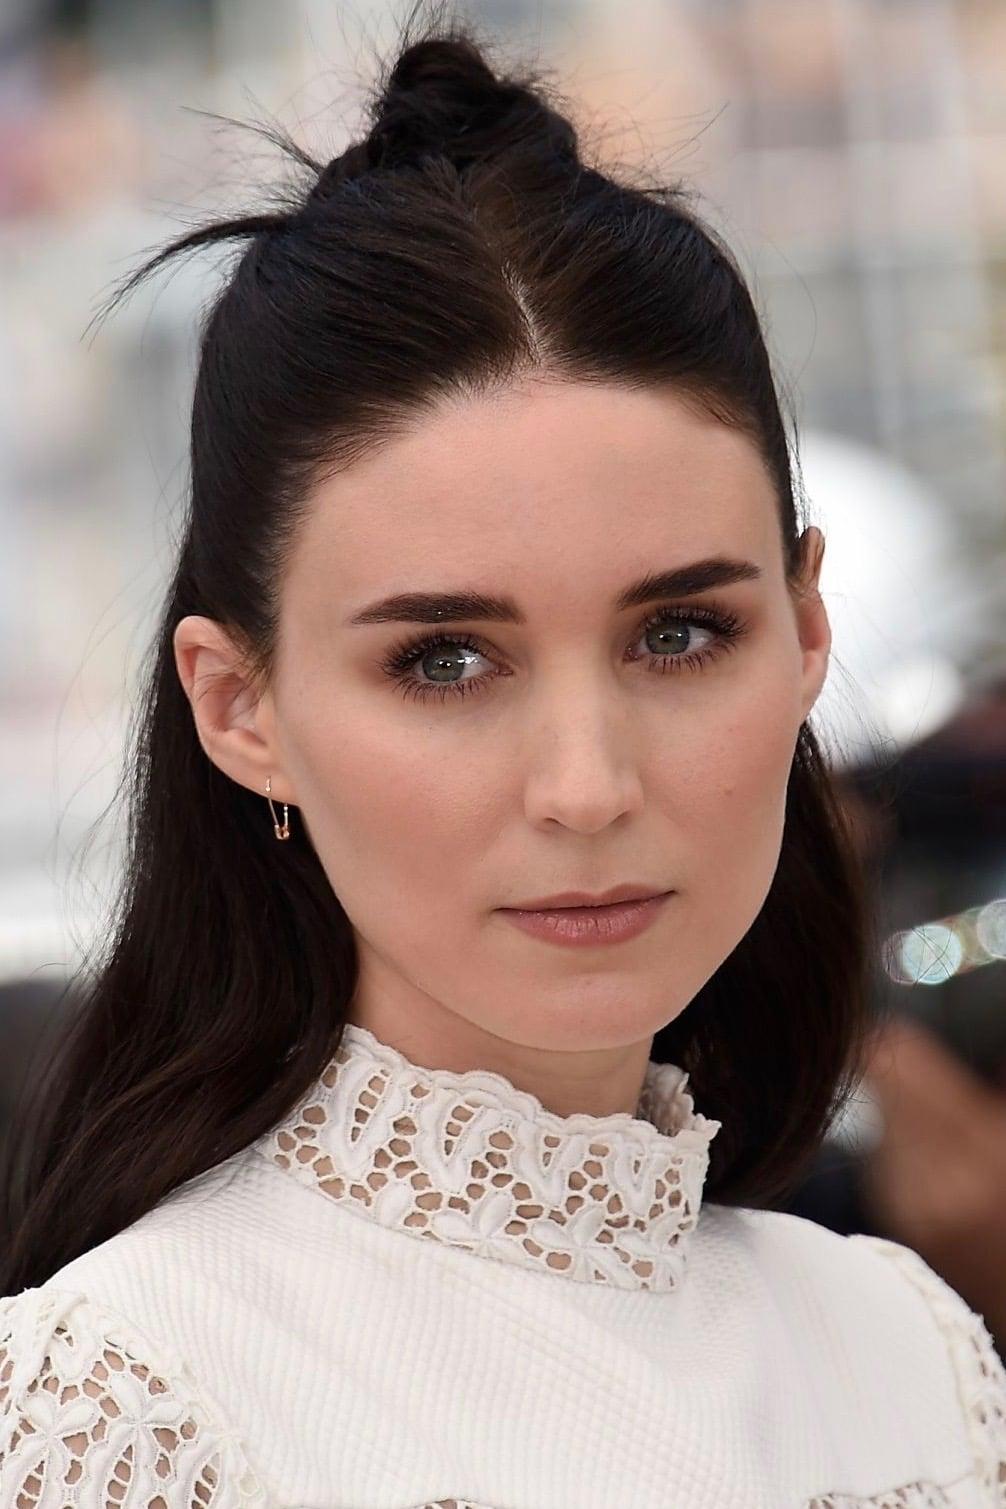 Met Gala 2018 Rooney Mara's tearful eye makeup | Hollywood ...  |Rooney Mara